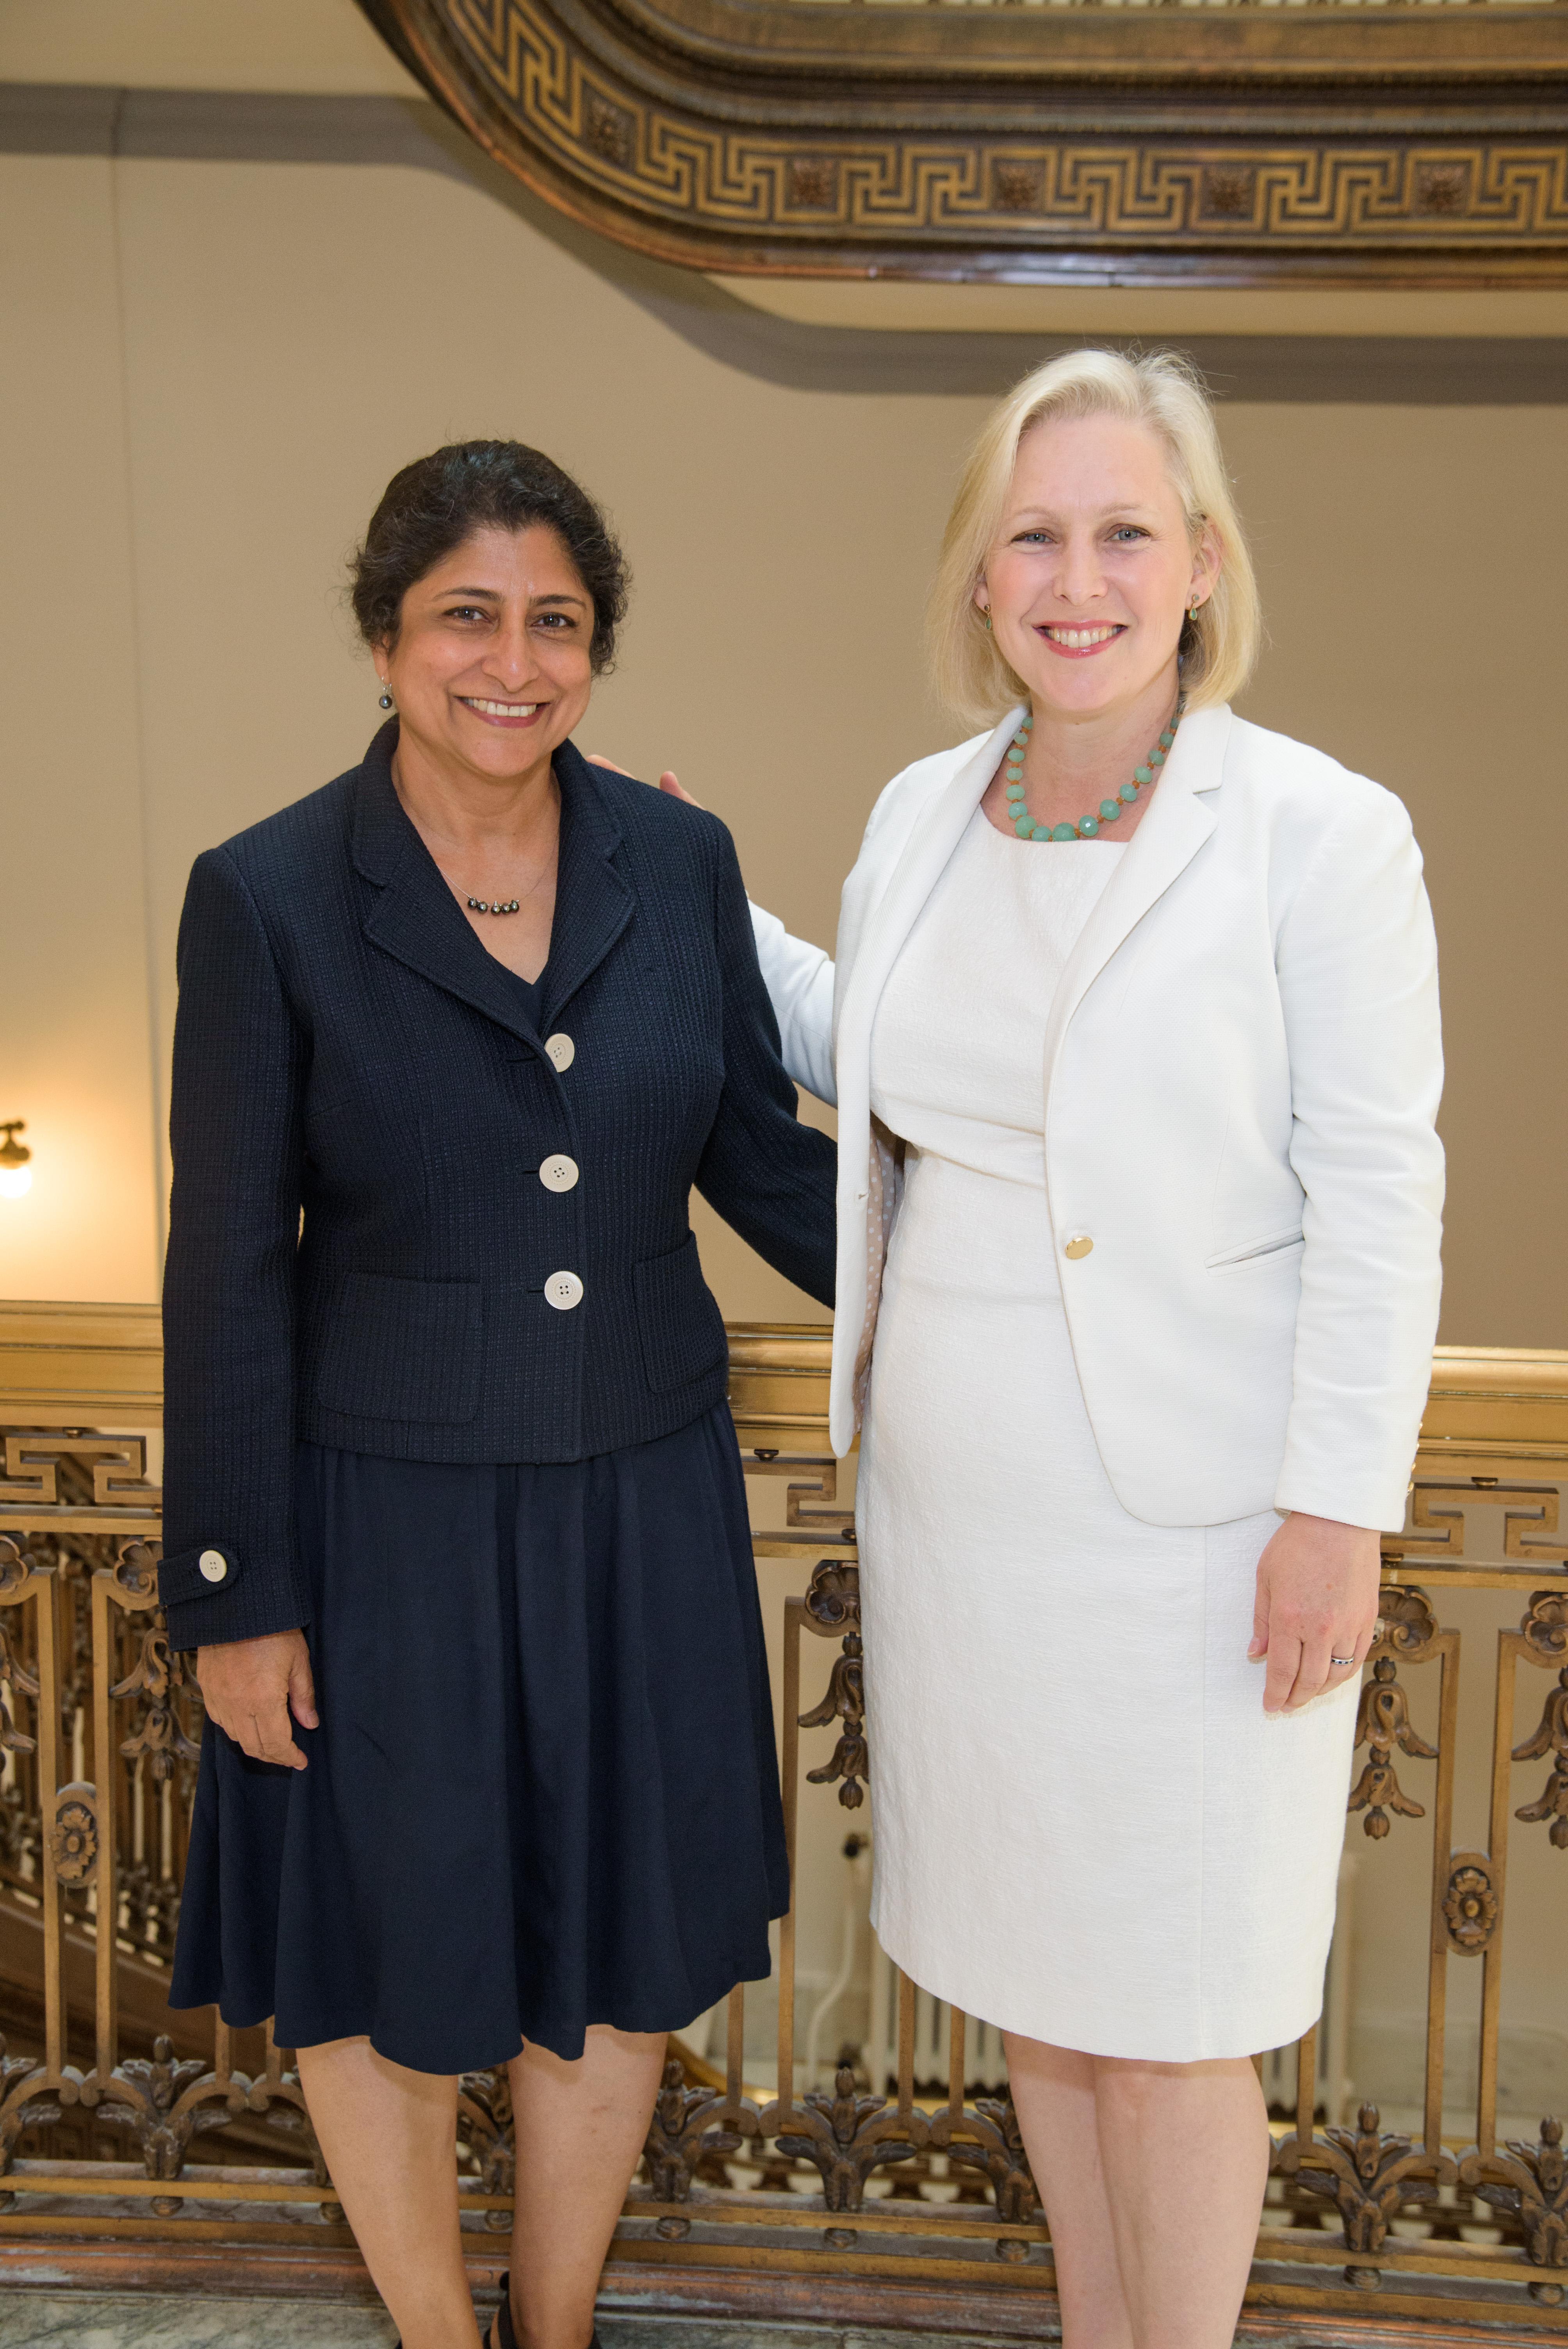 ASU prof Punam Ohri-Vachaspati and Senator Kirsten Gillibrand